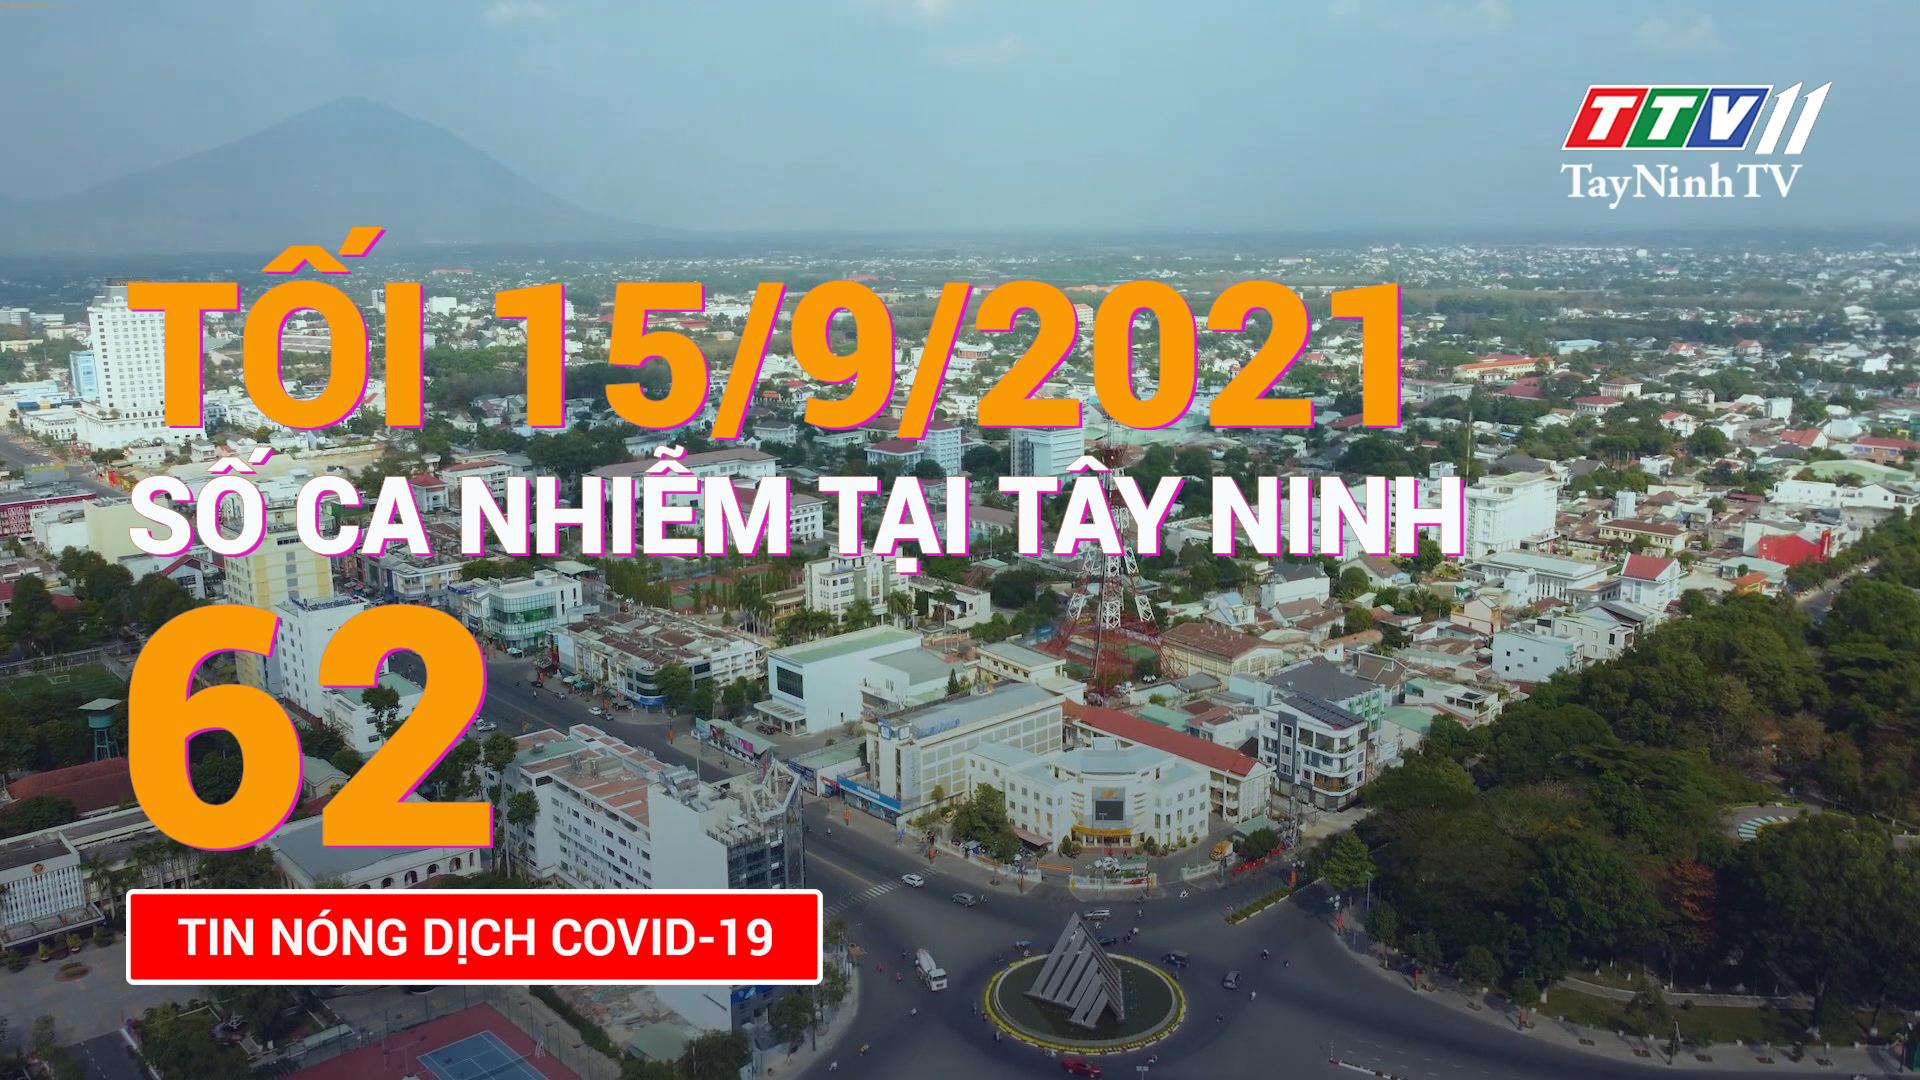 Tin tức Covid-19 tối 15/9/2021 | TayNinhTV